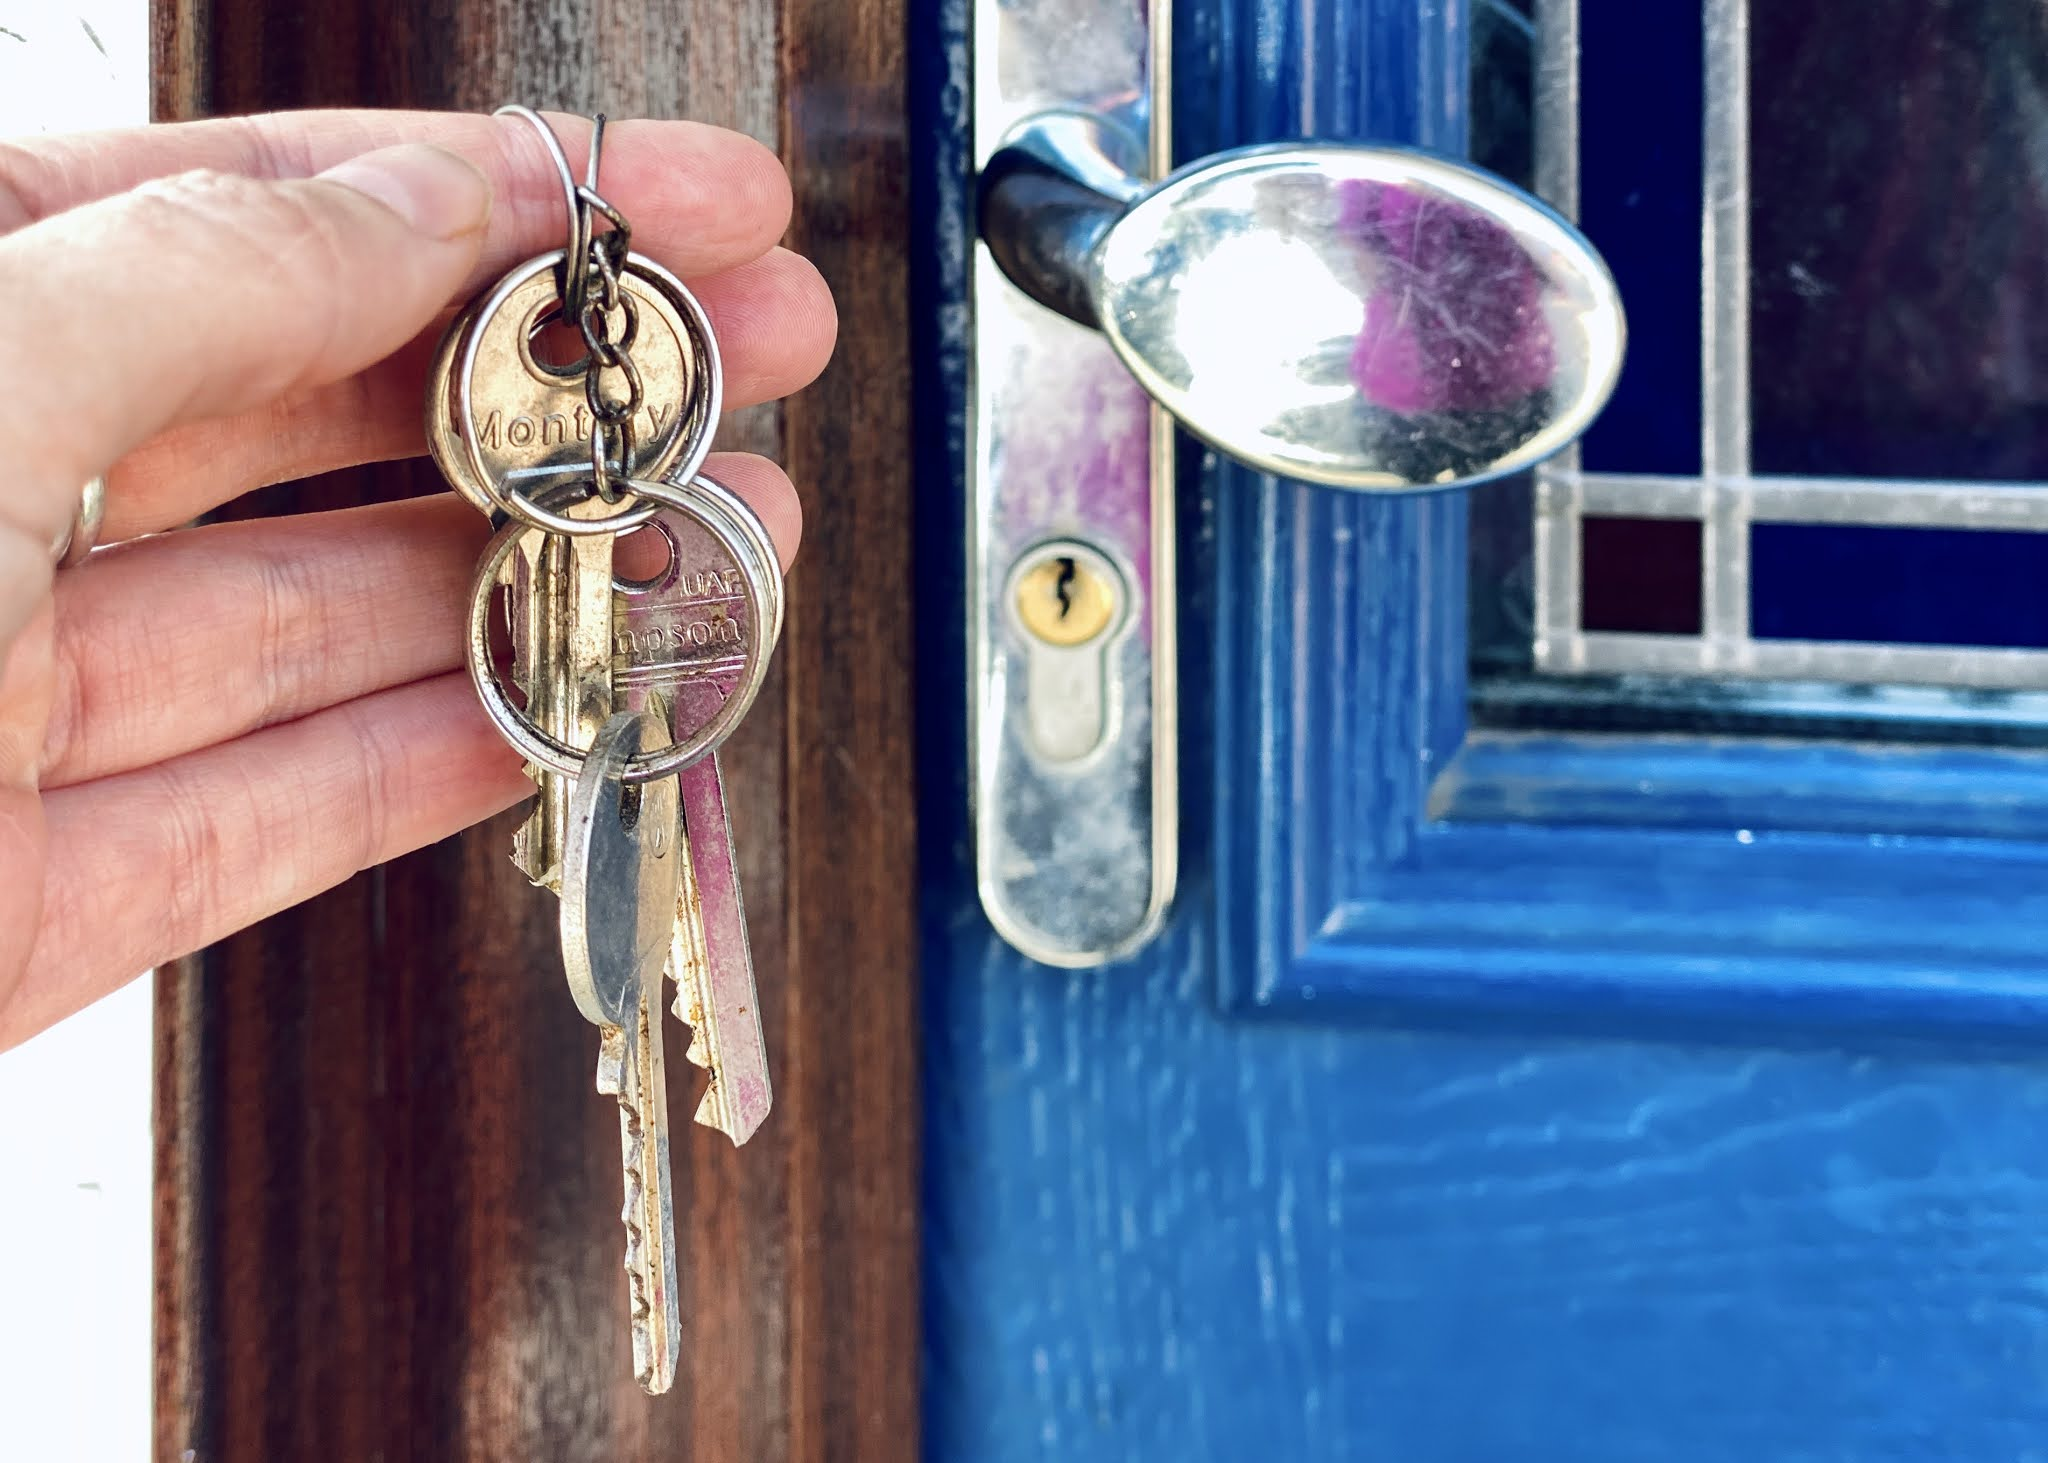 A set of keys outside a blue front door